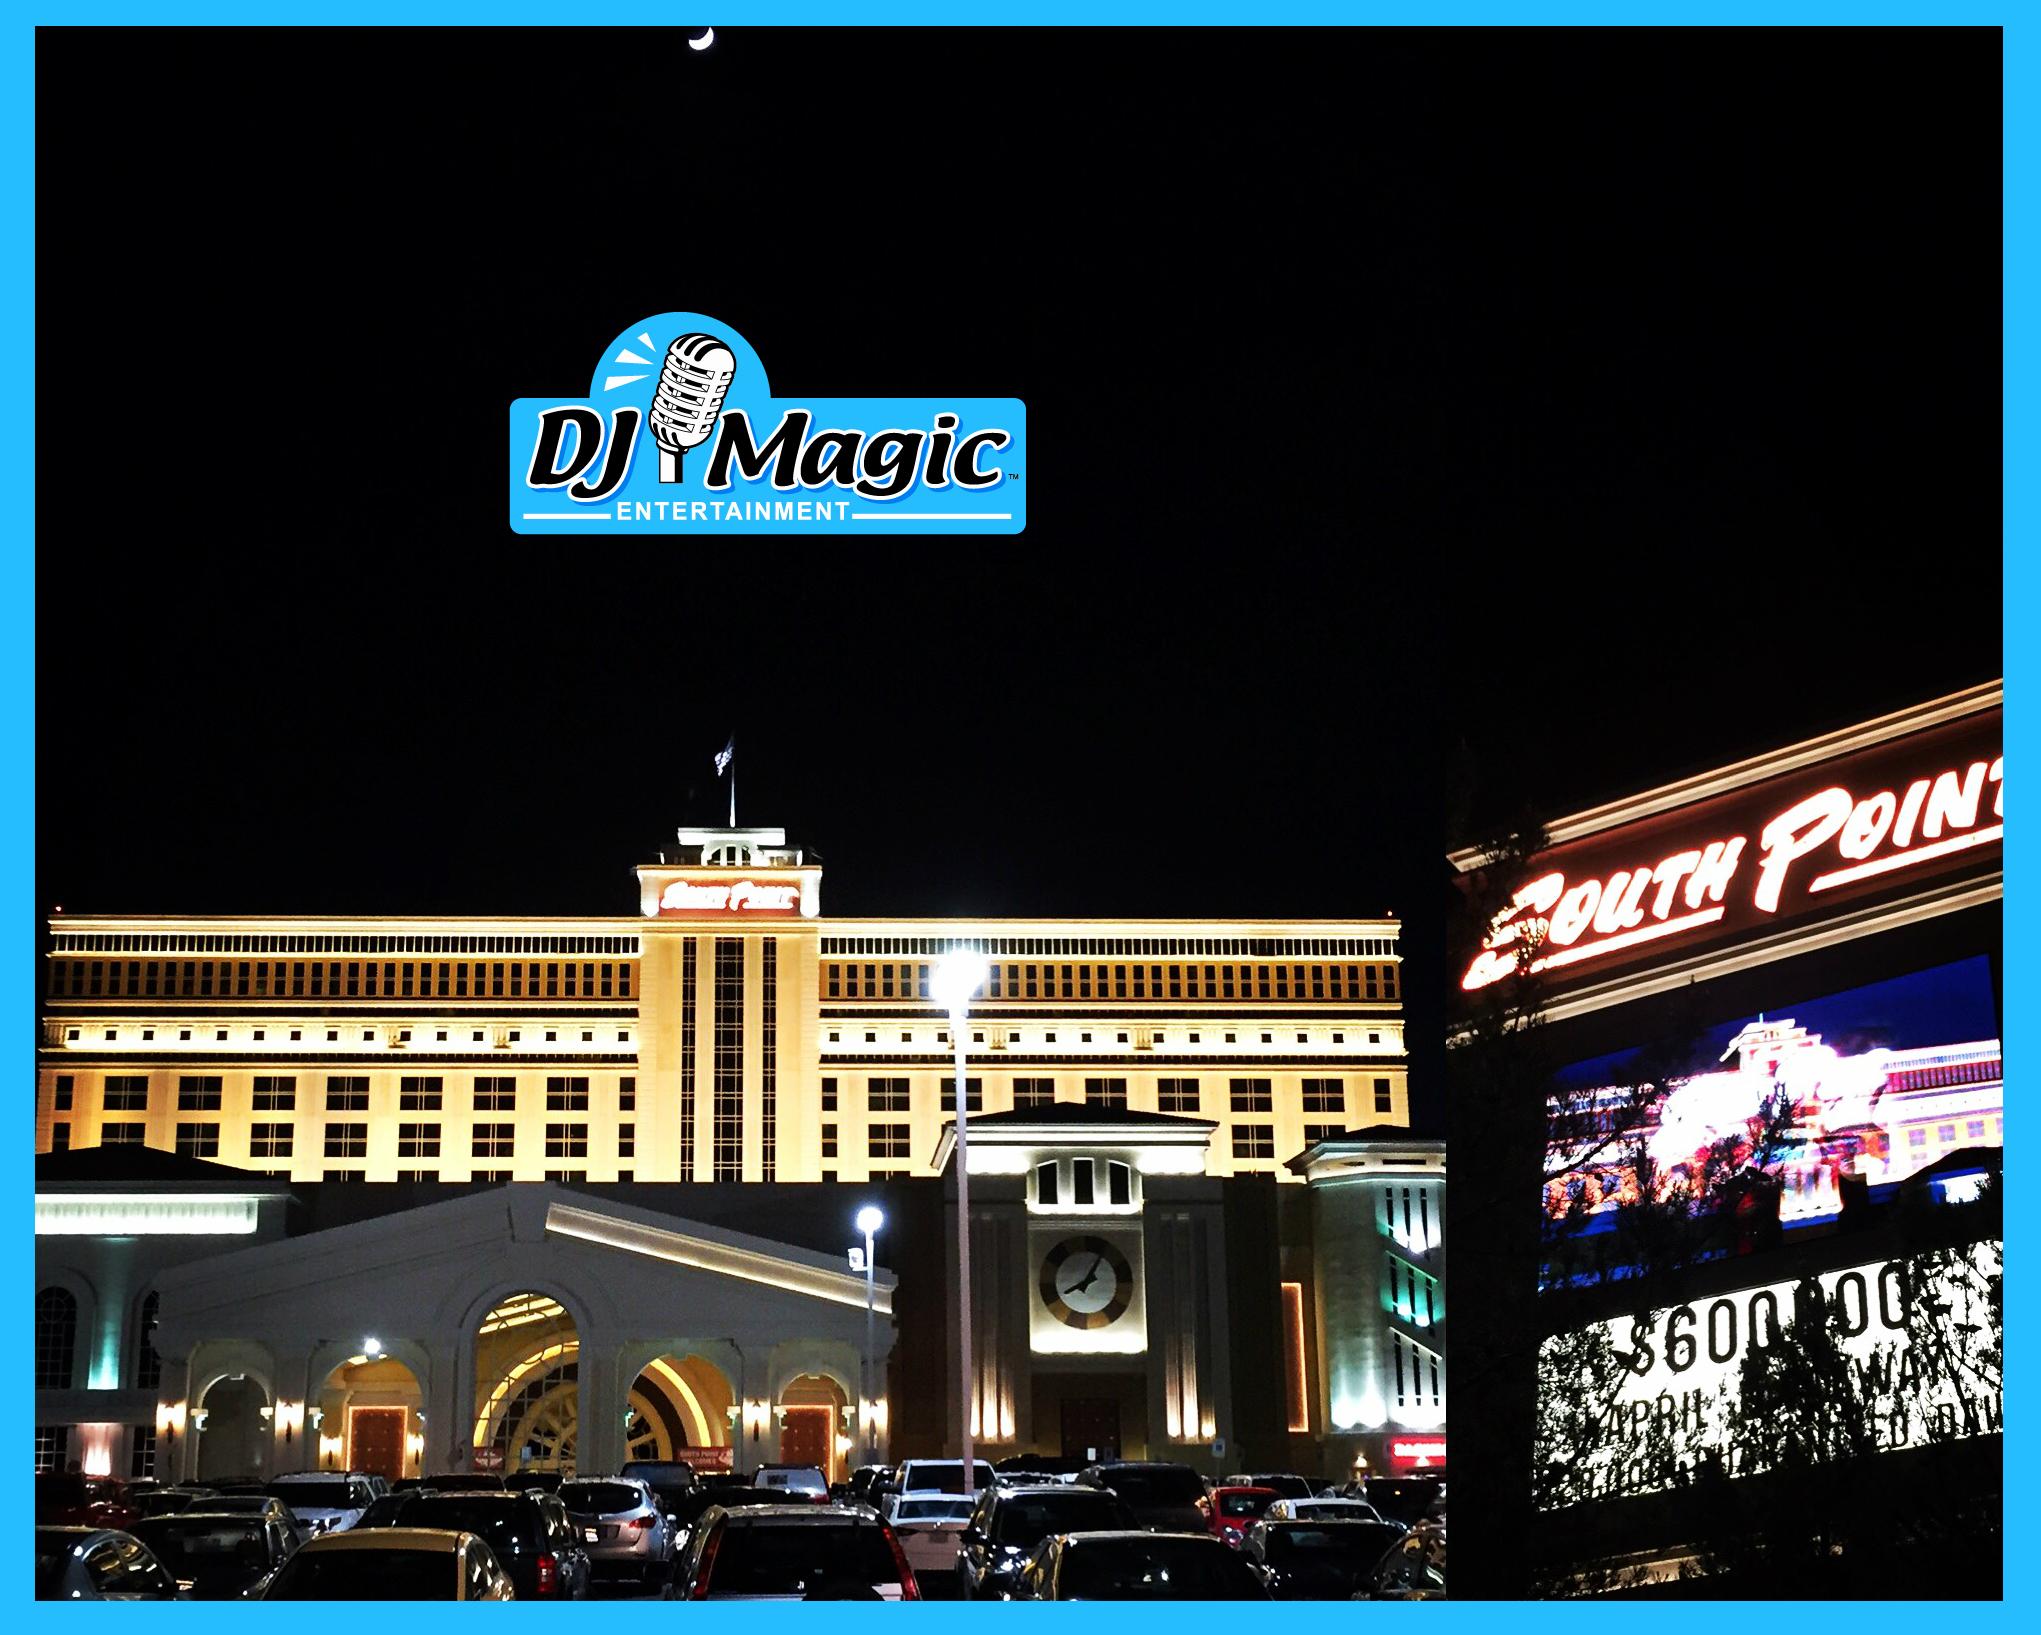 DJ Magic Photo Booth services heads to Las Vegas.